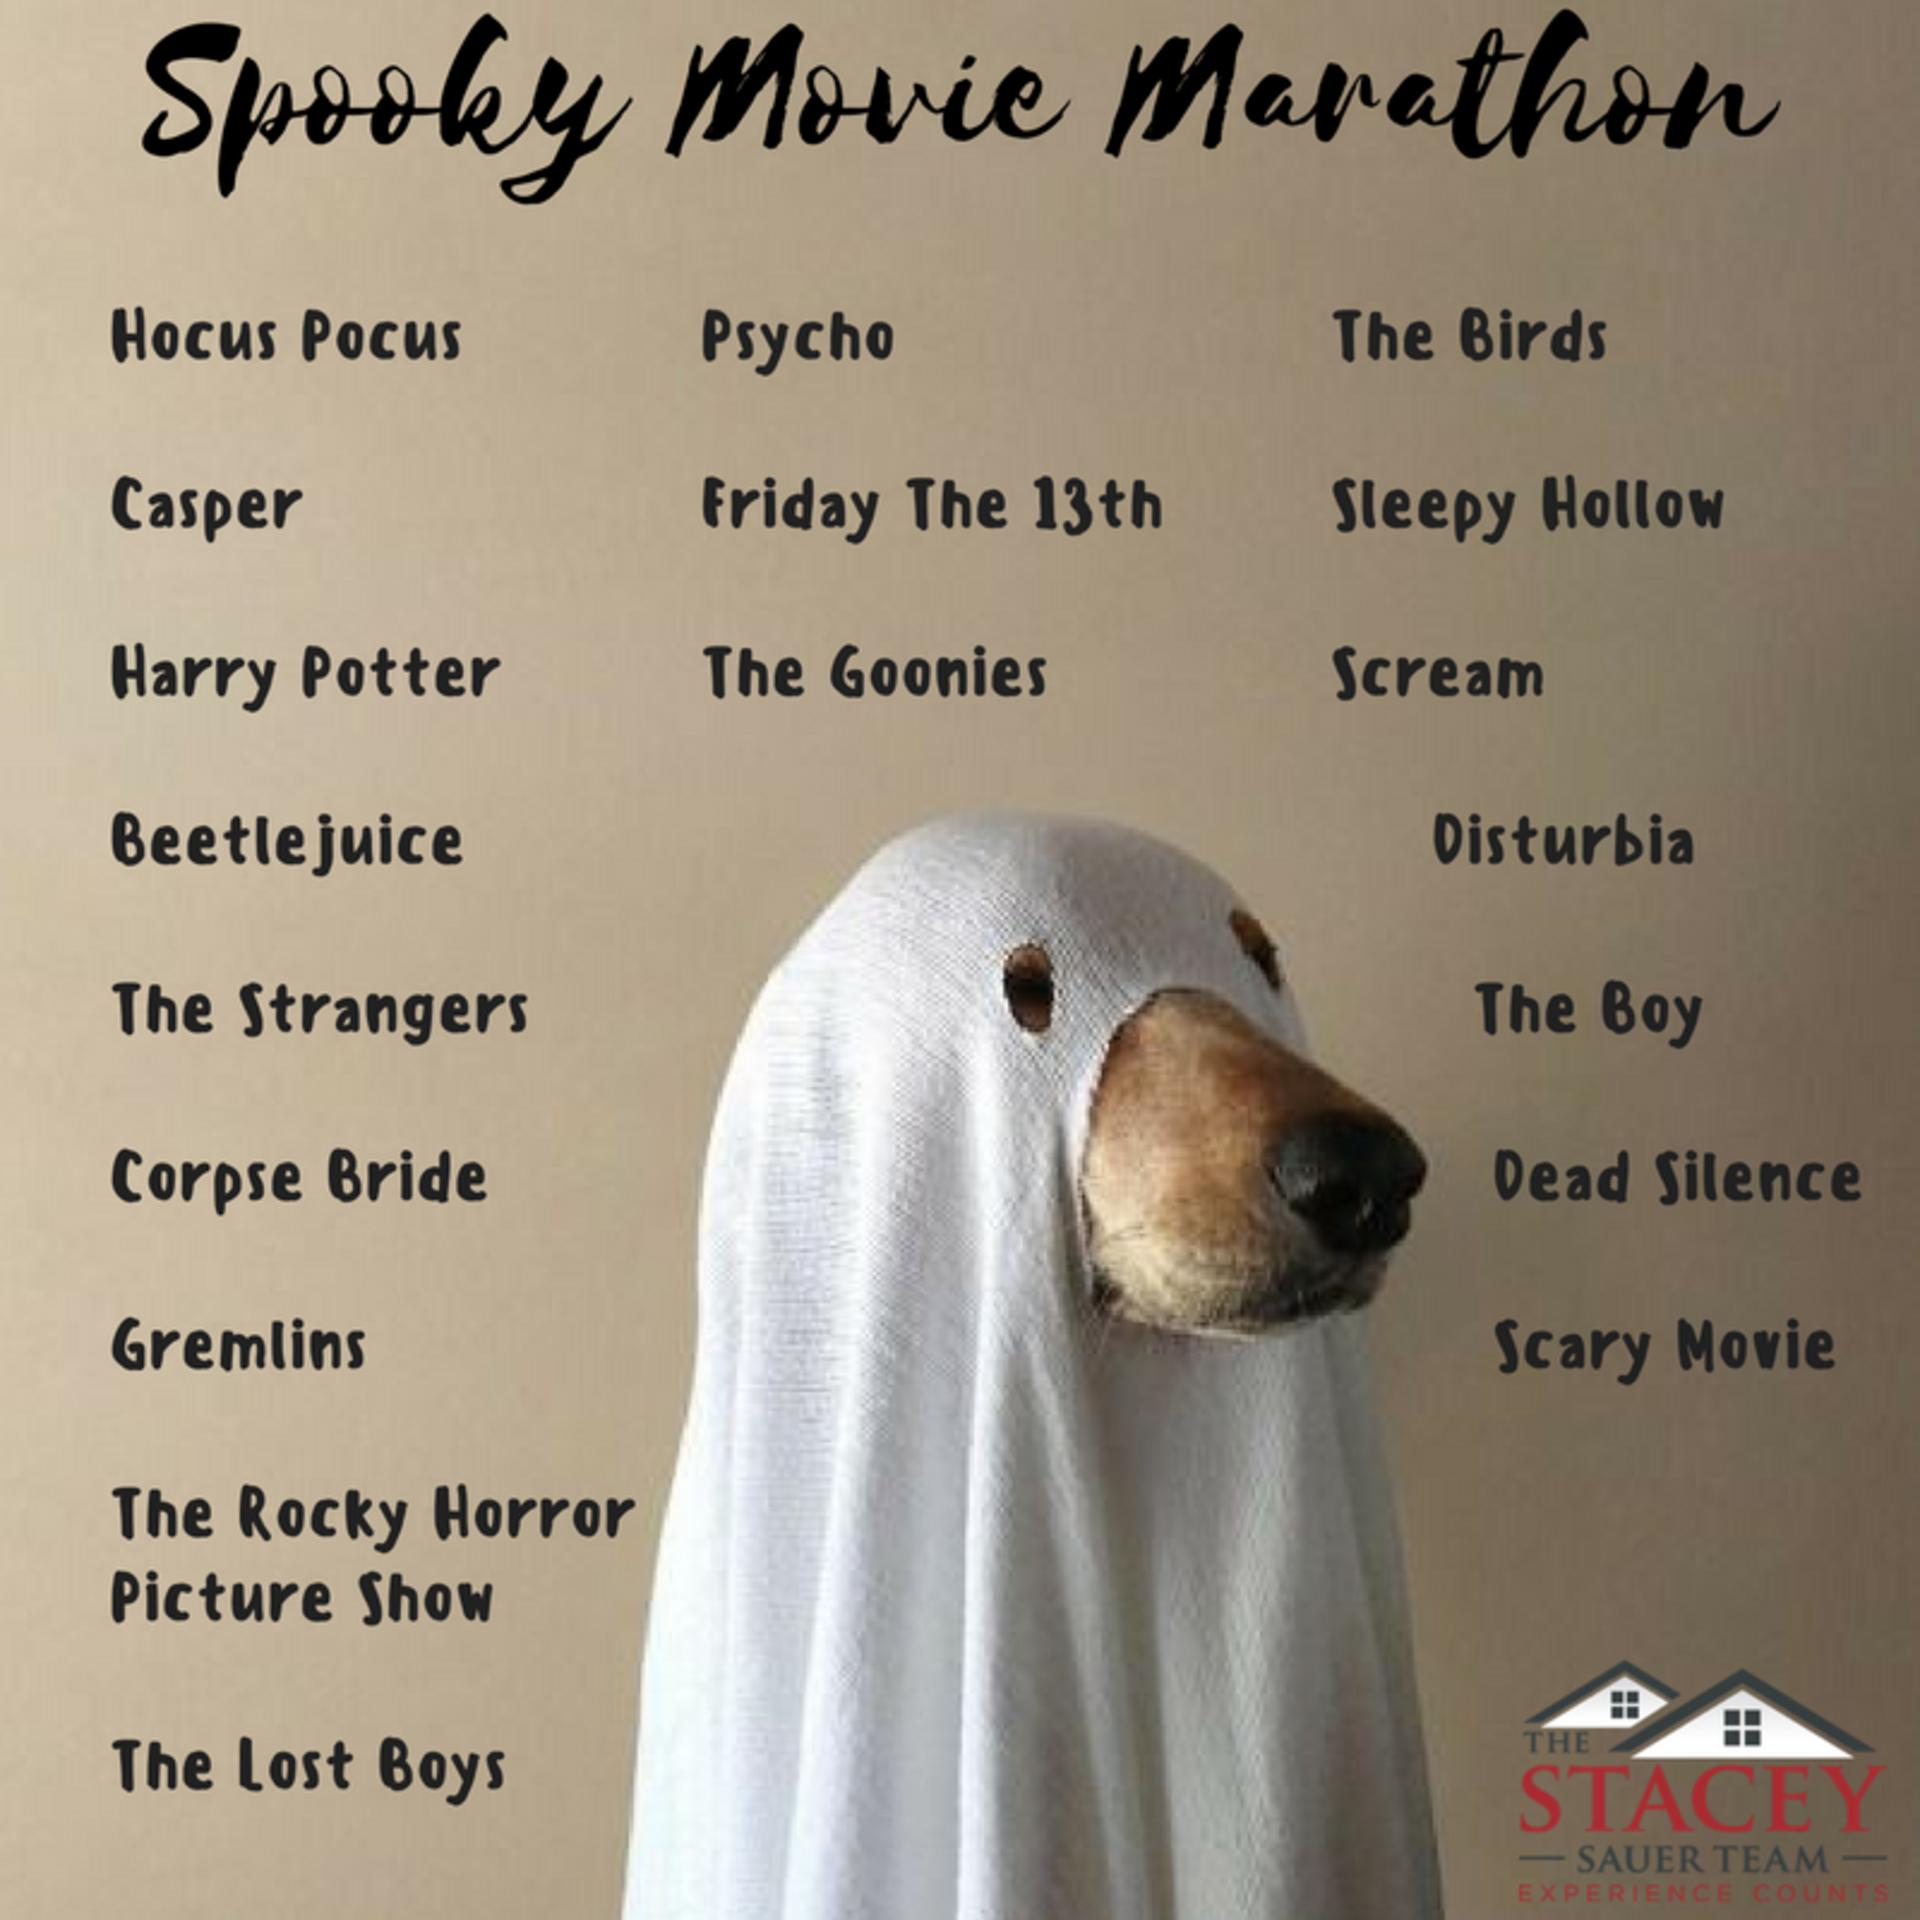 Let's Get Spooky